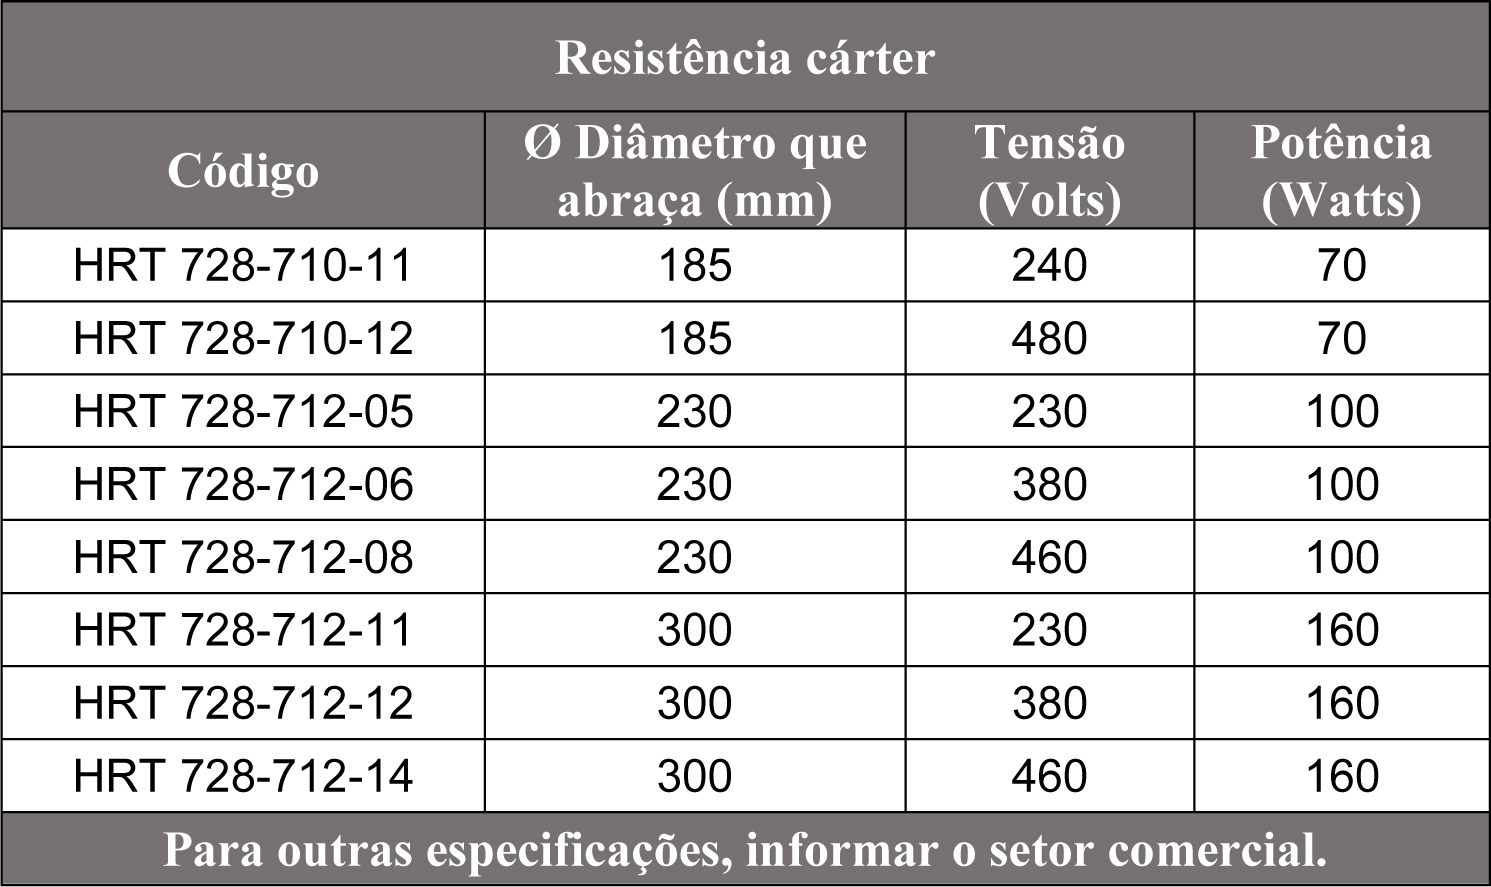 Resistência Cárter Tabela